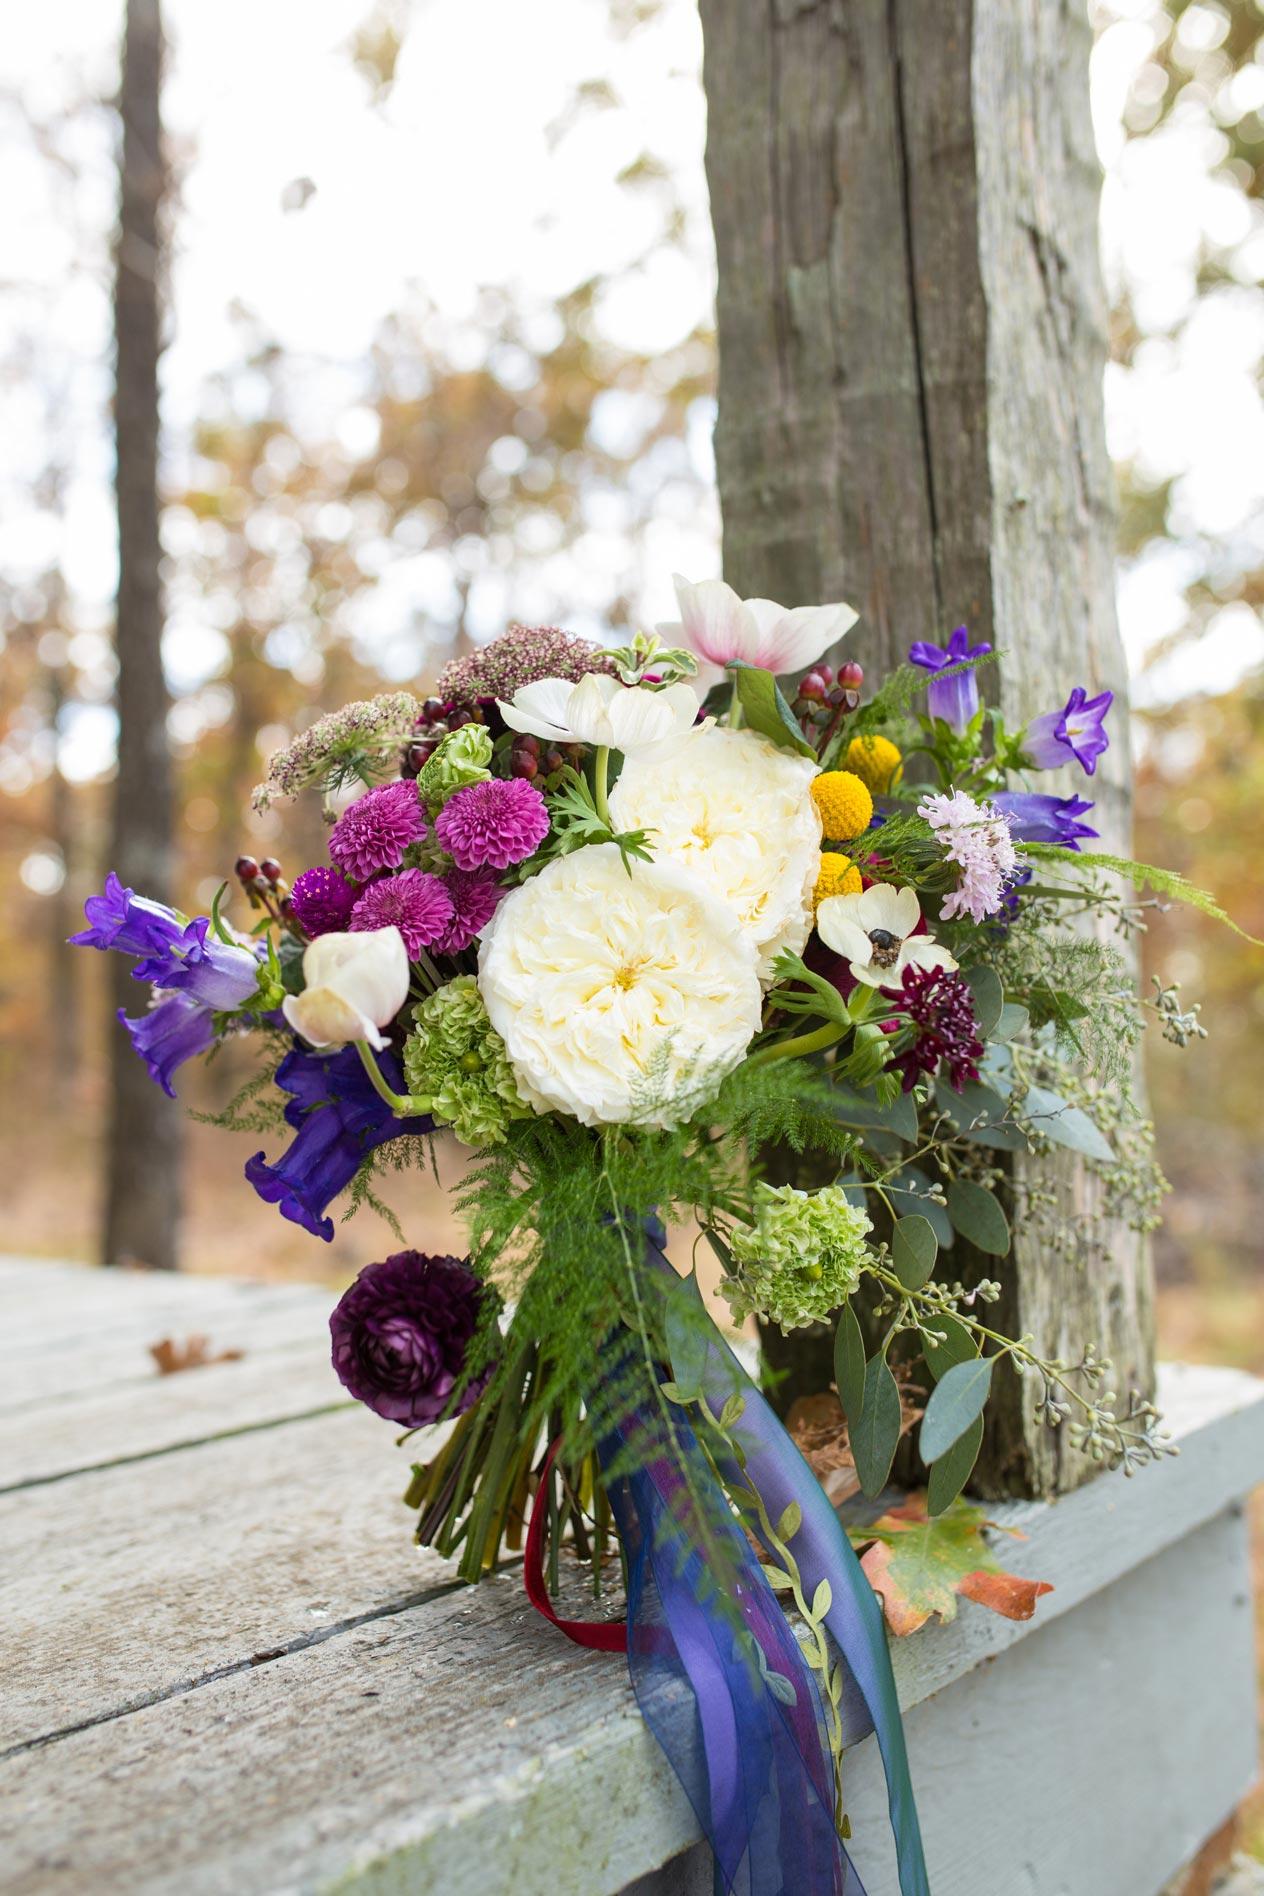 Rustic-Whimsical-Wedding- Tulsa-Wedding-FloristRobyns-Flower-Garden_Mallory-Hall-Photography08.jpg